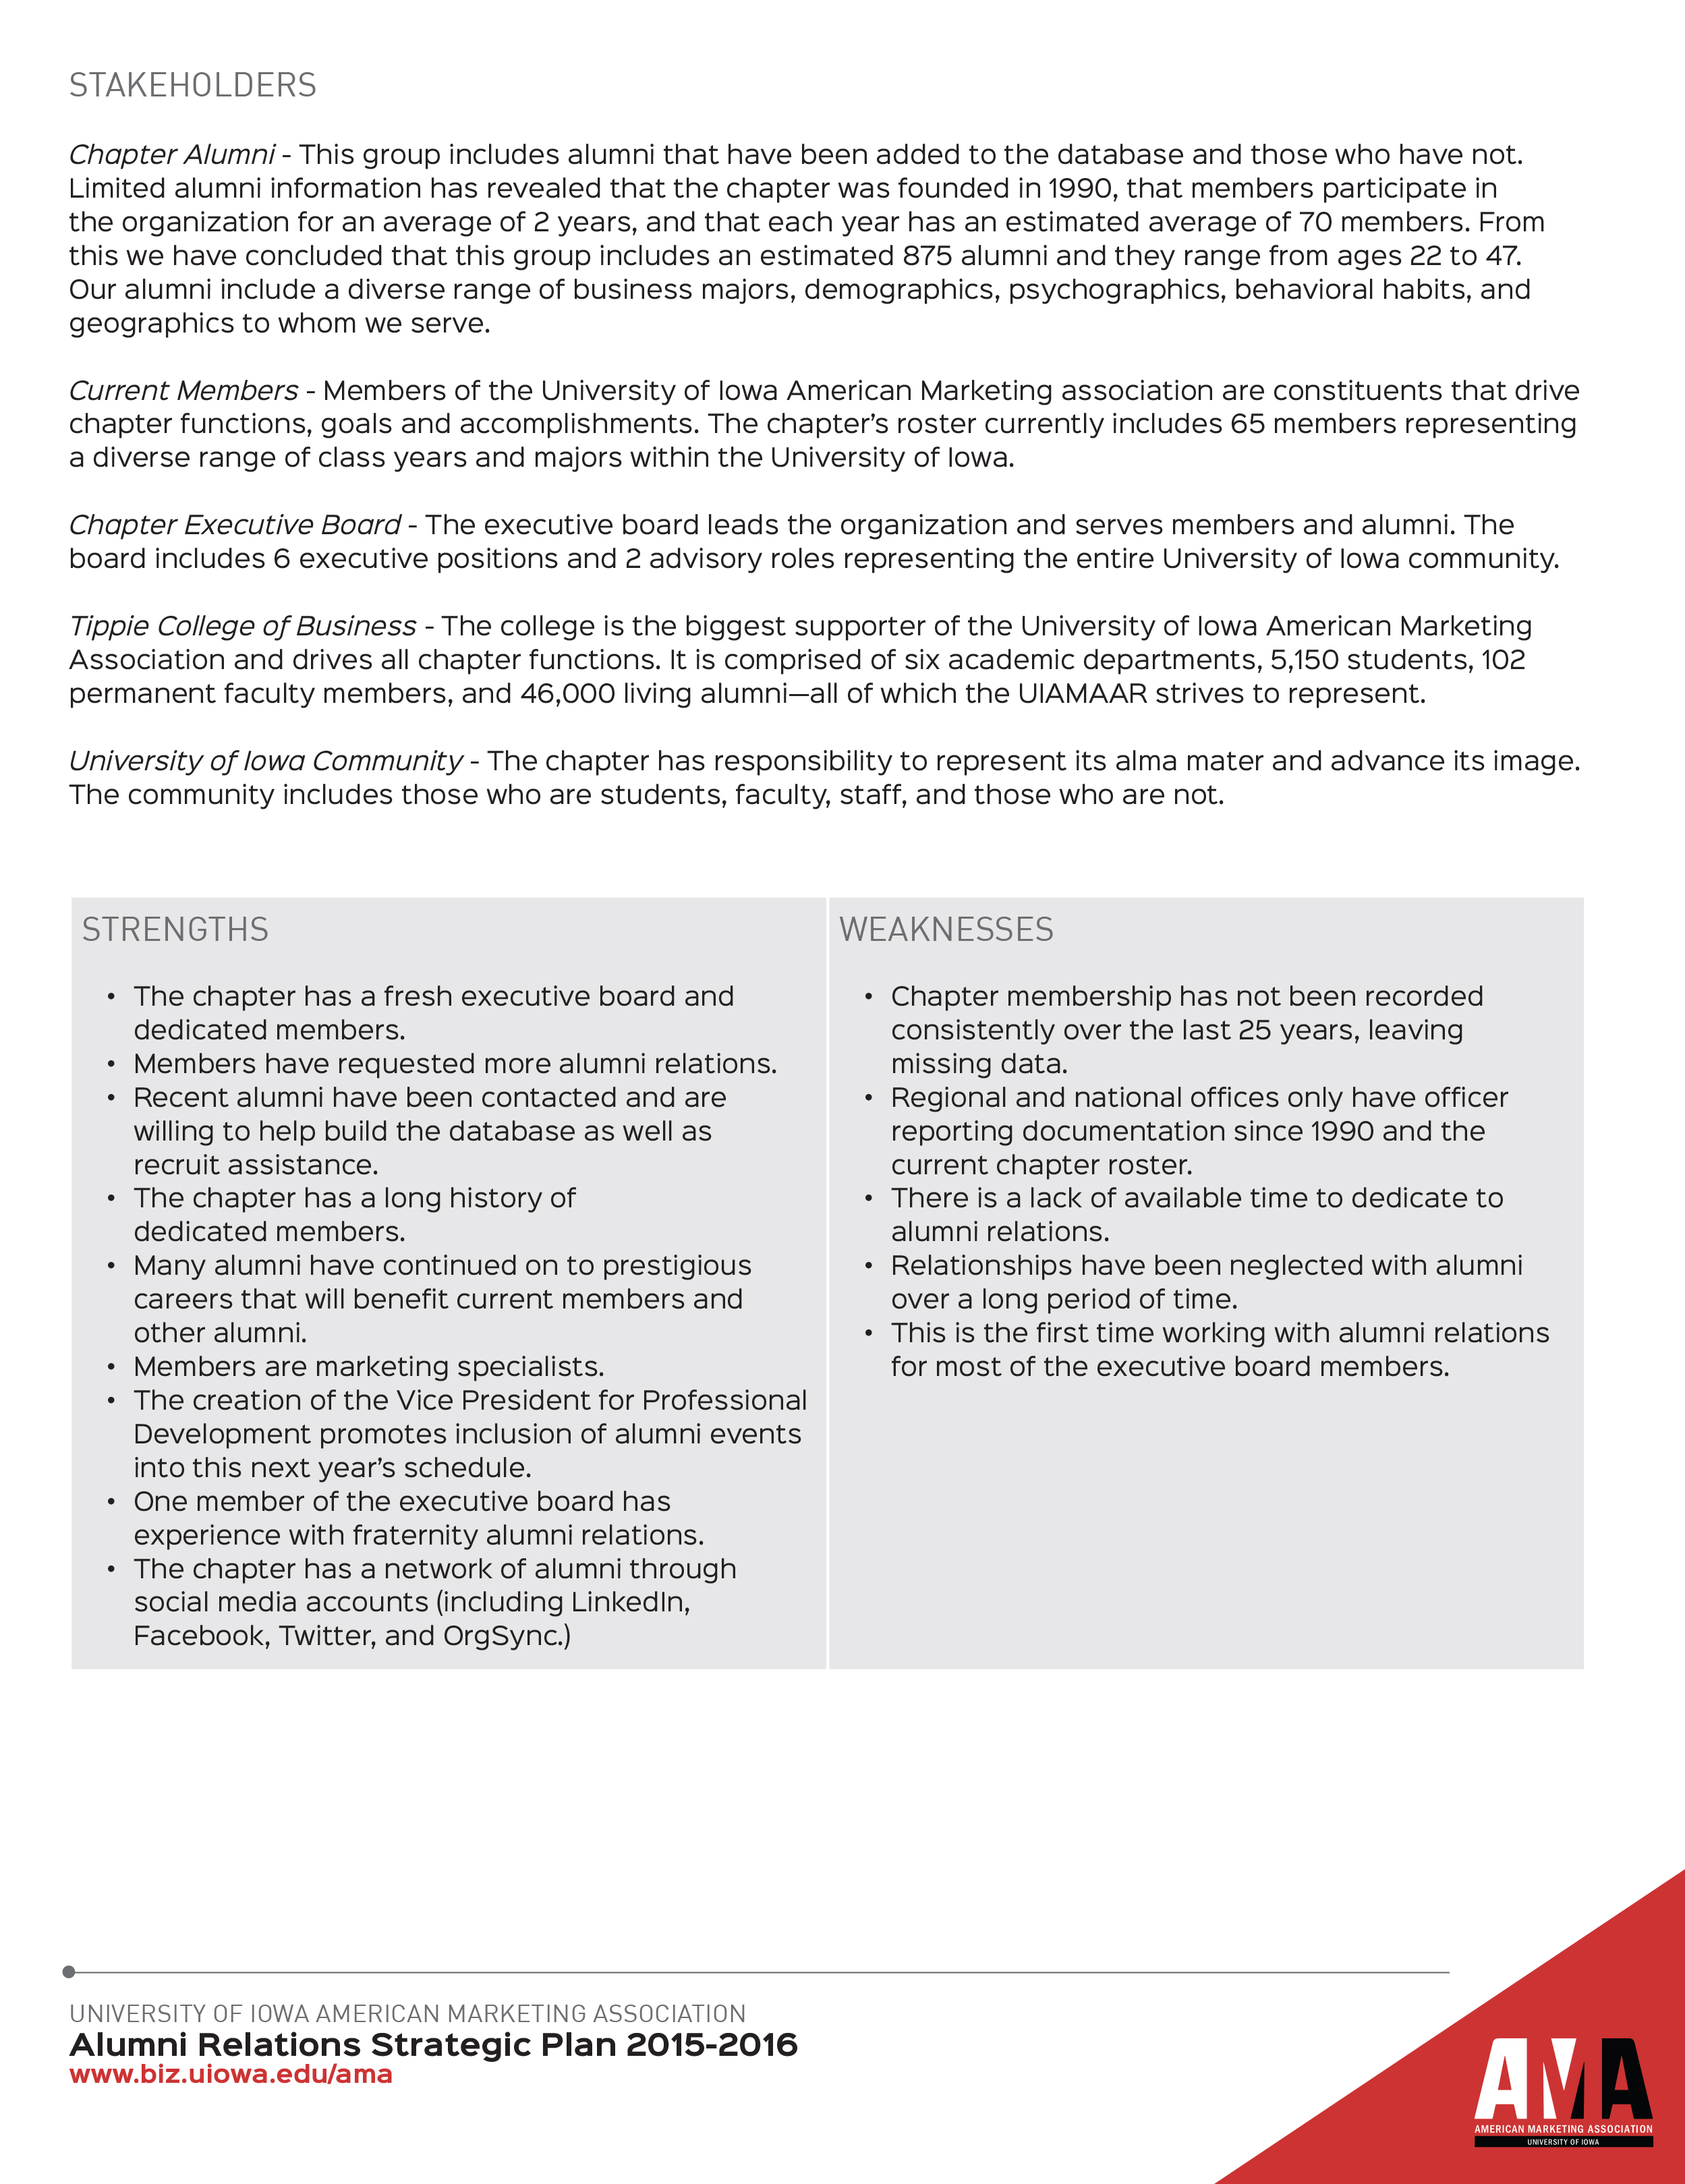 ama_alumnistrategicplan-3.jpg